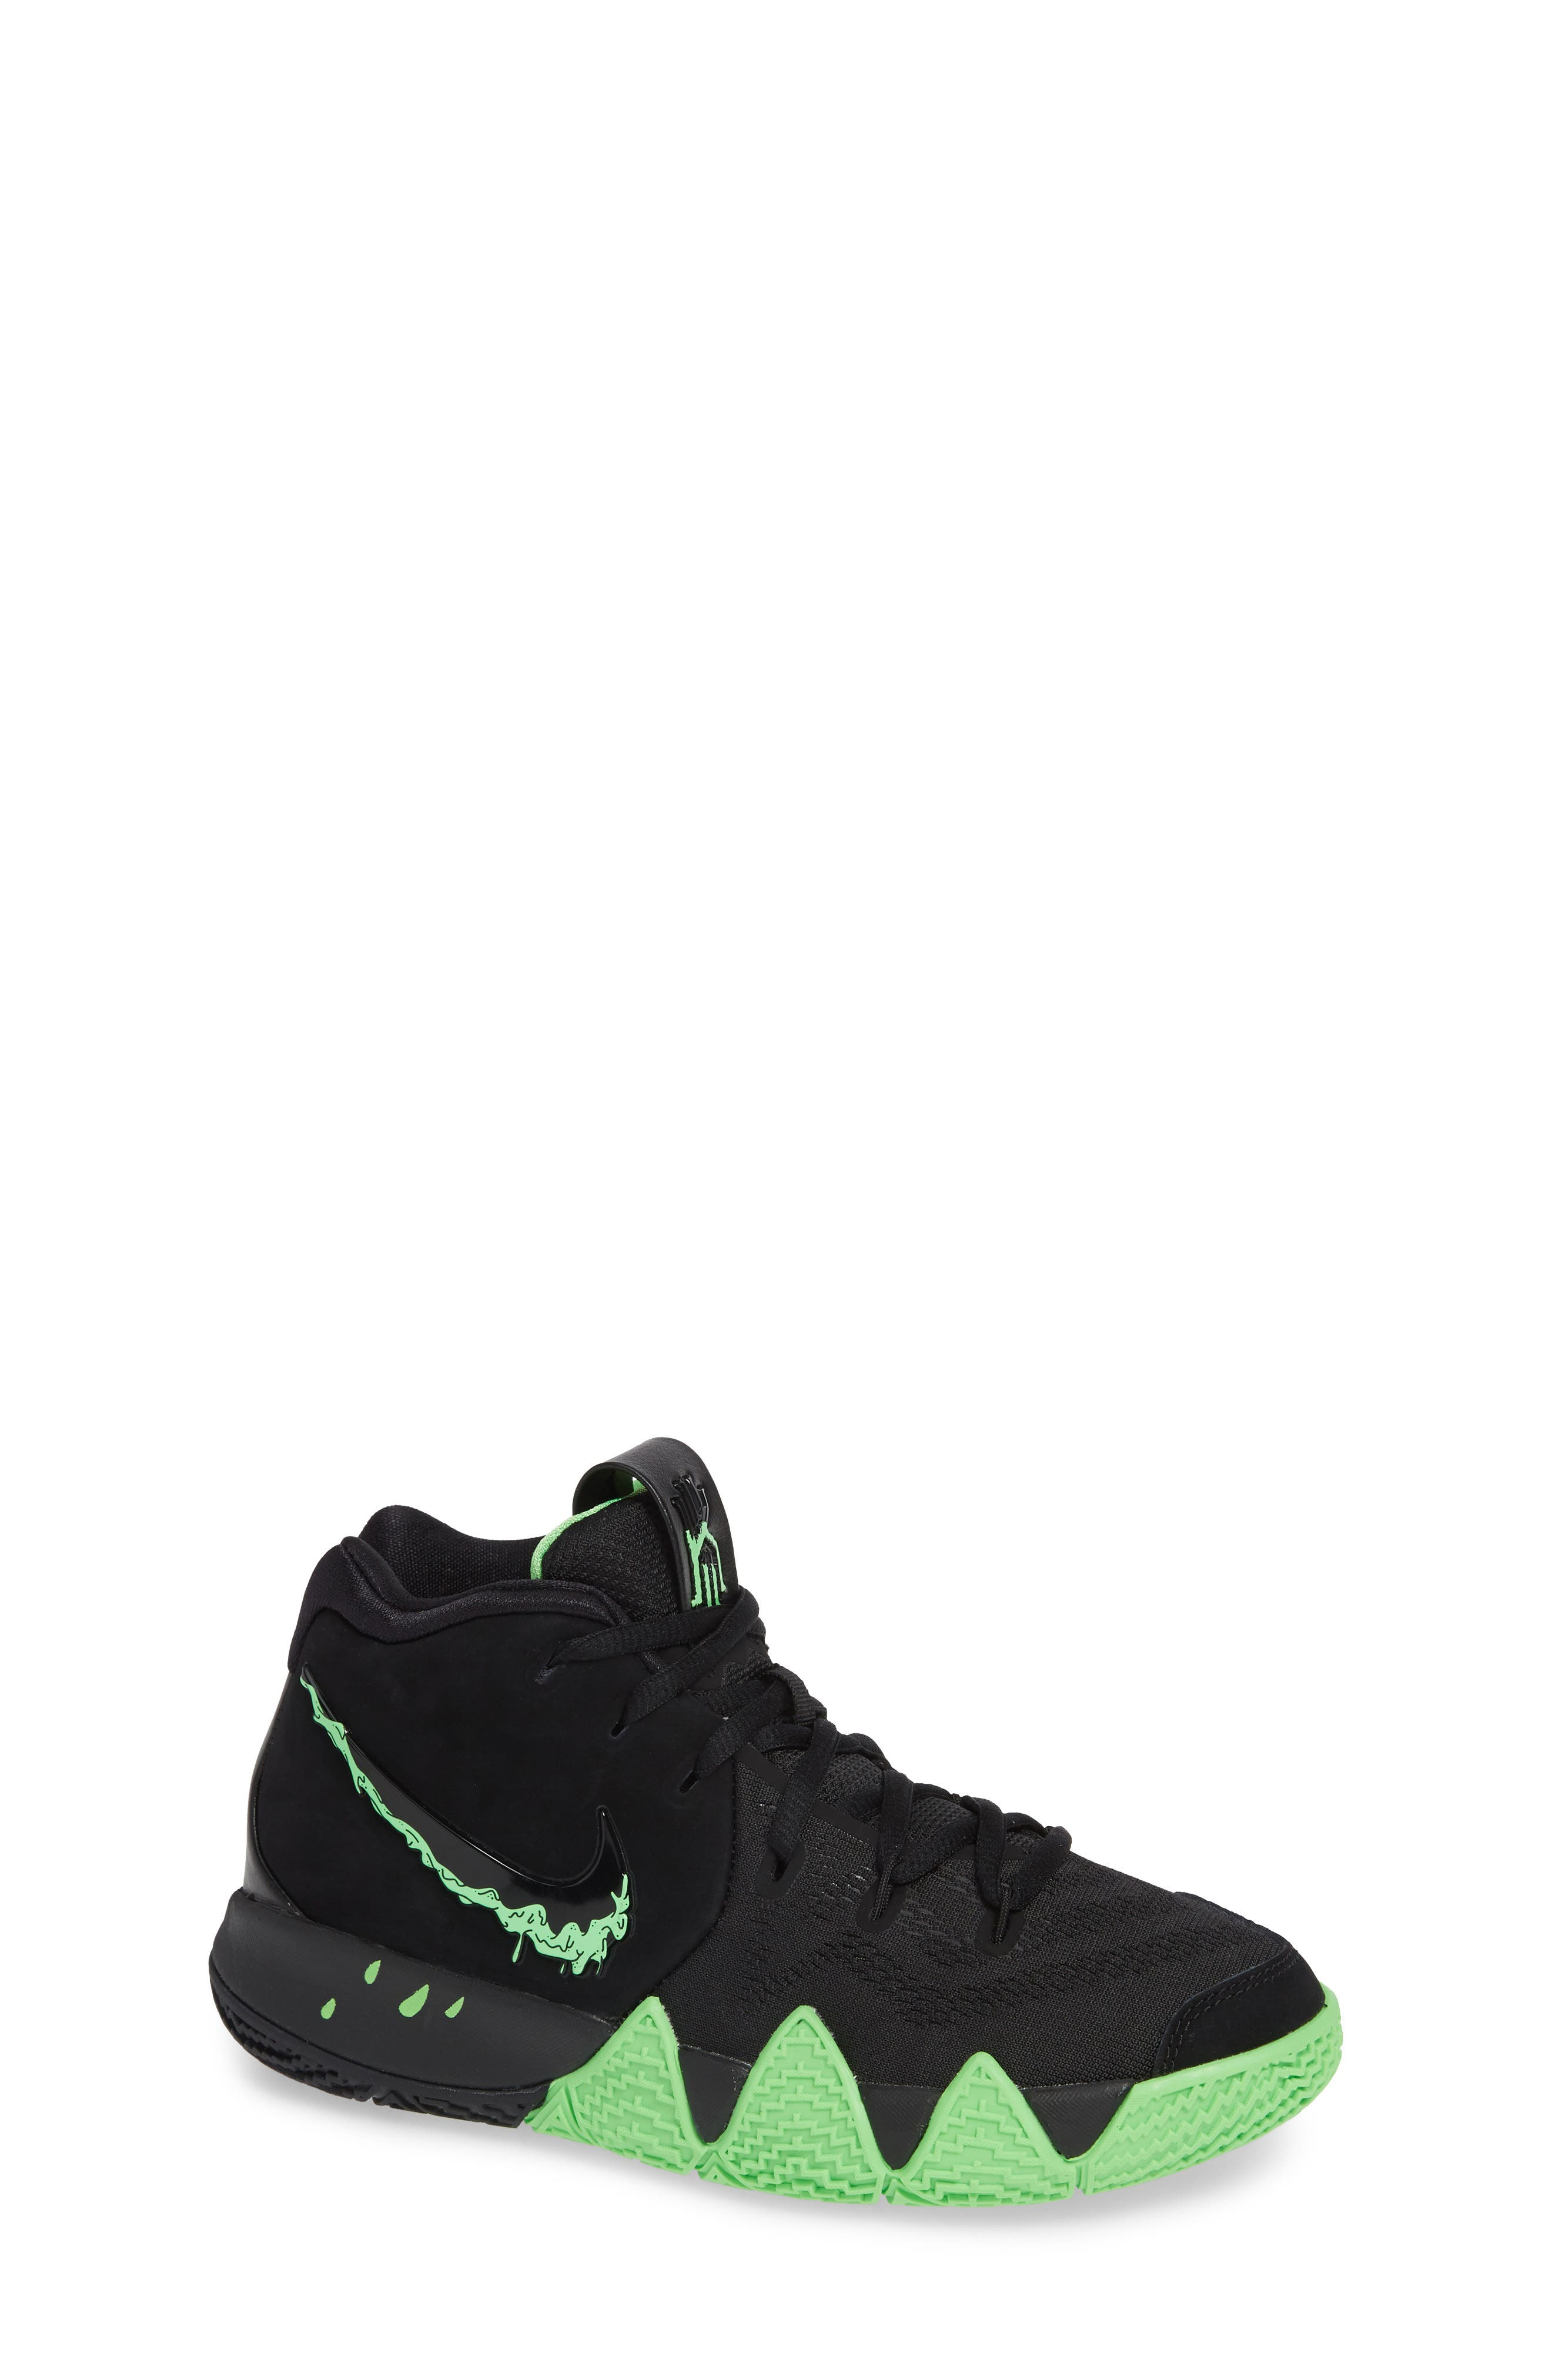 Kyrie 4 Basketball Shoe,                             Main thumbnail 1, color,                             BLACK/ RAGE GREEN